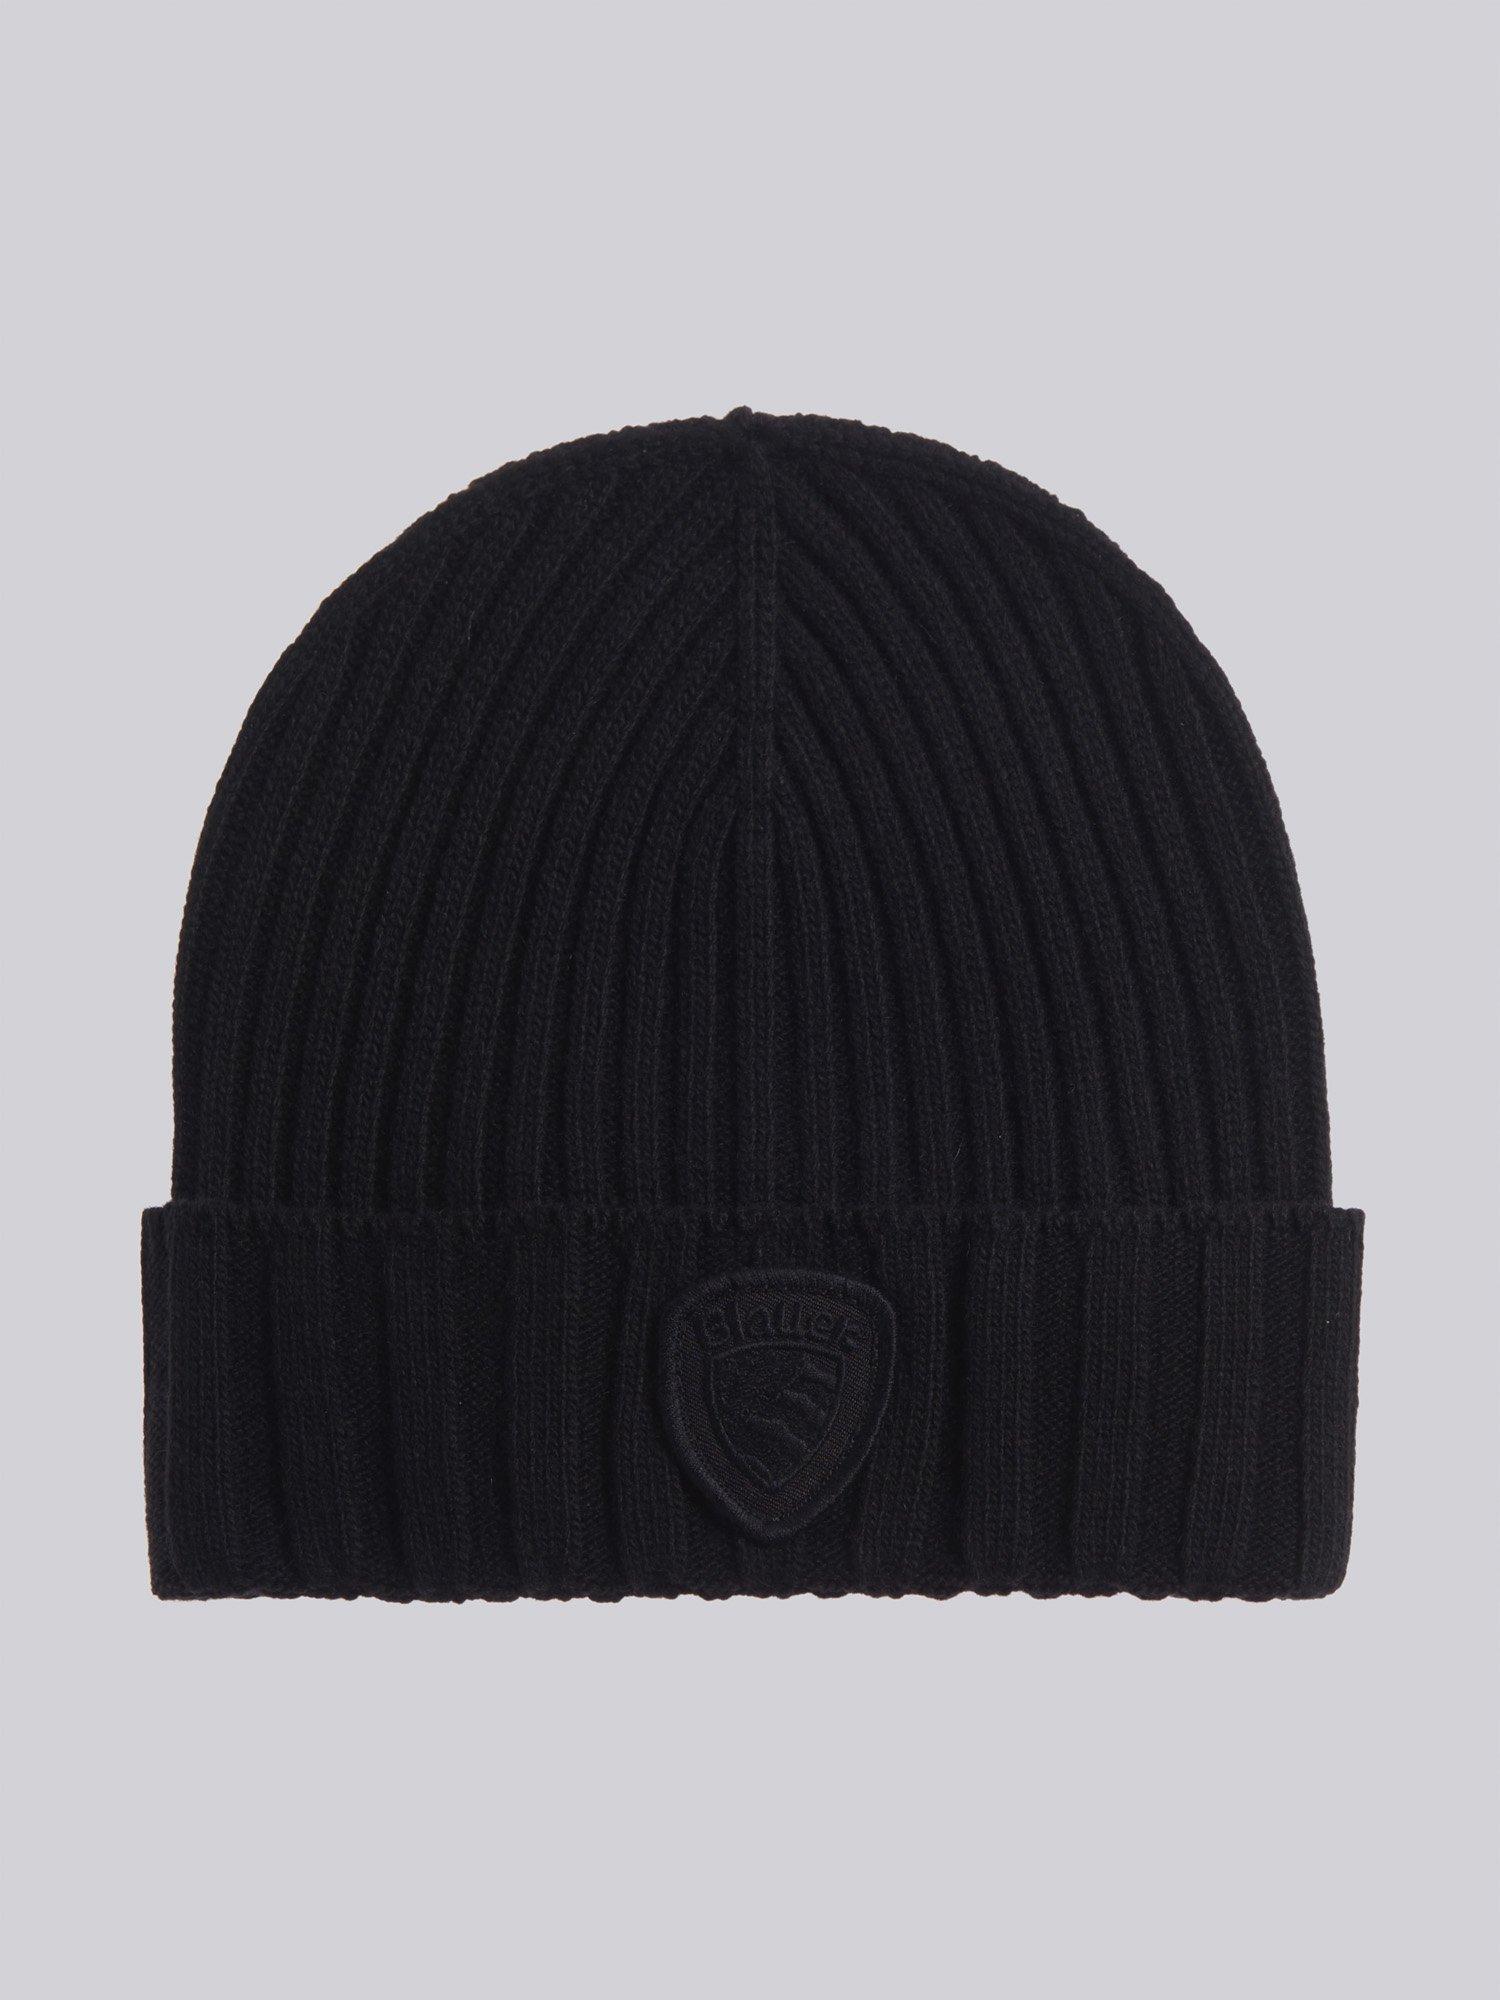 Blauer - JUNIOR CLASSIC CAP - черный - Blauer